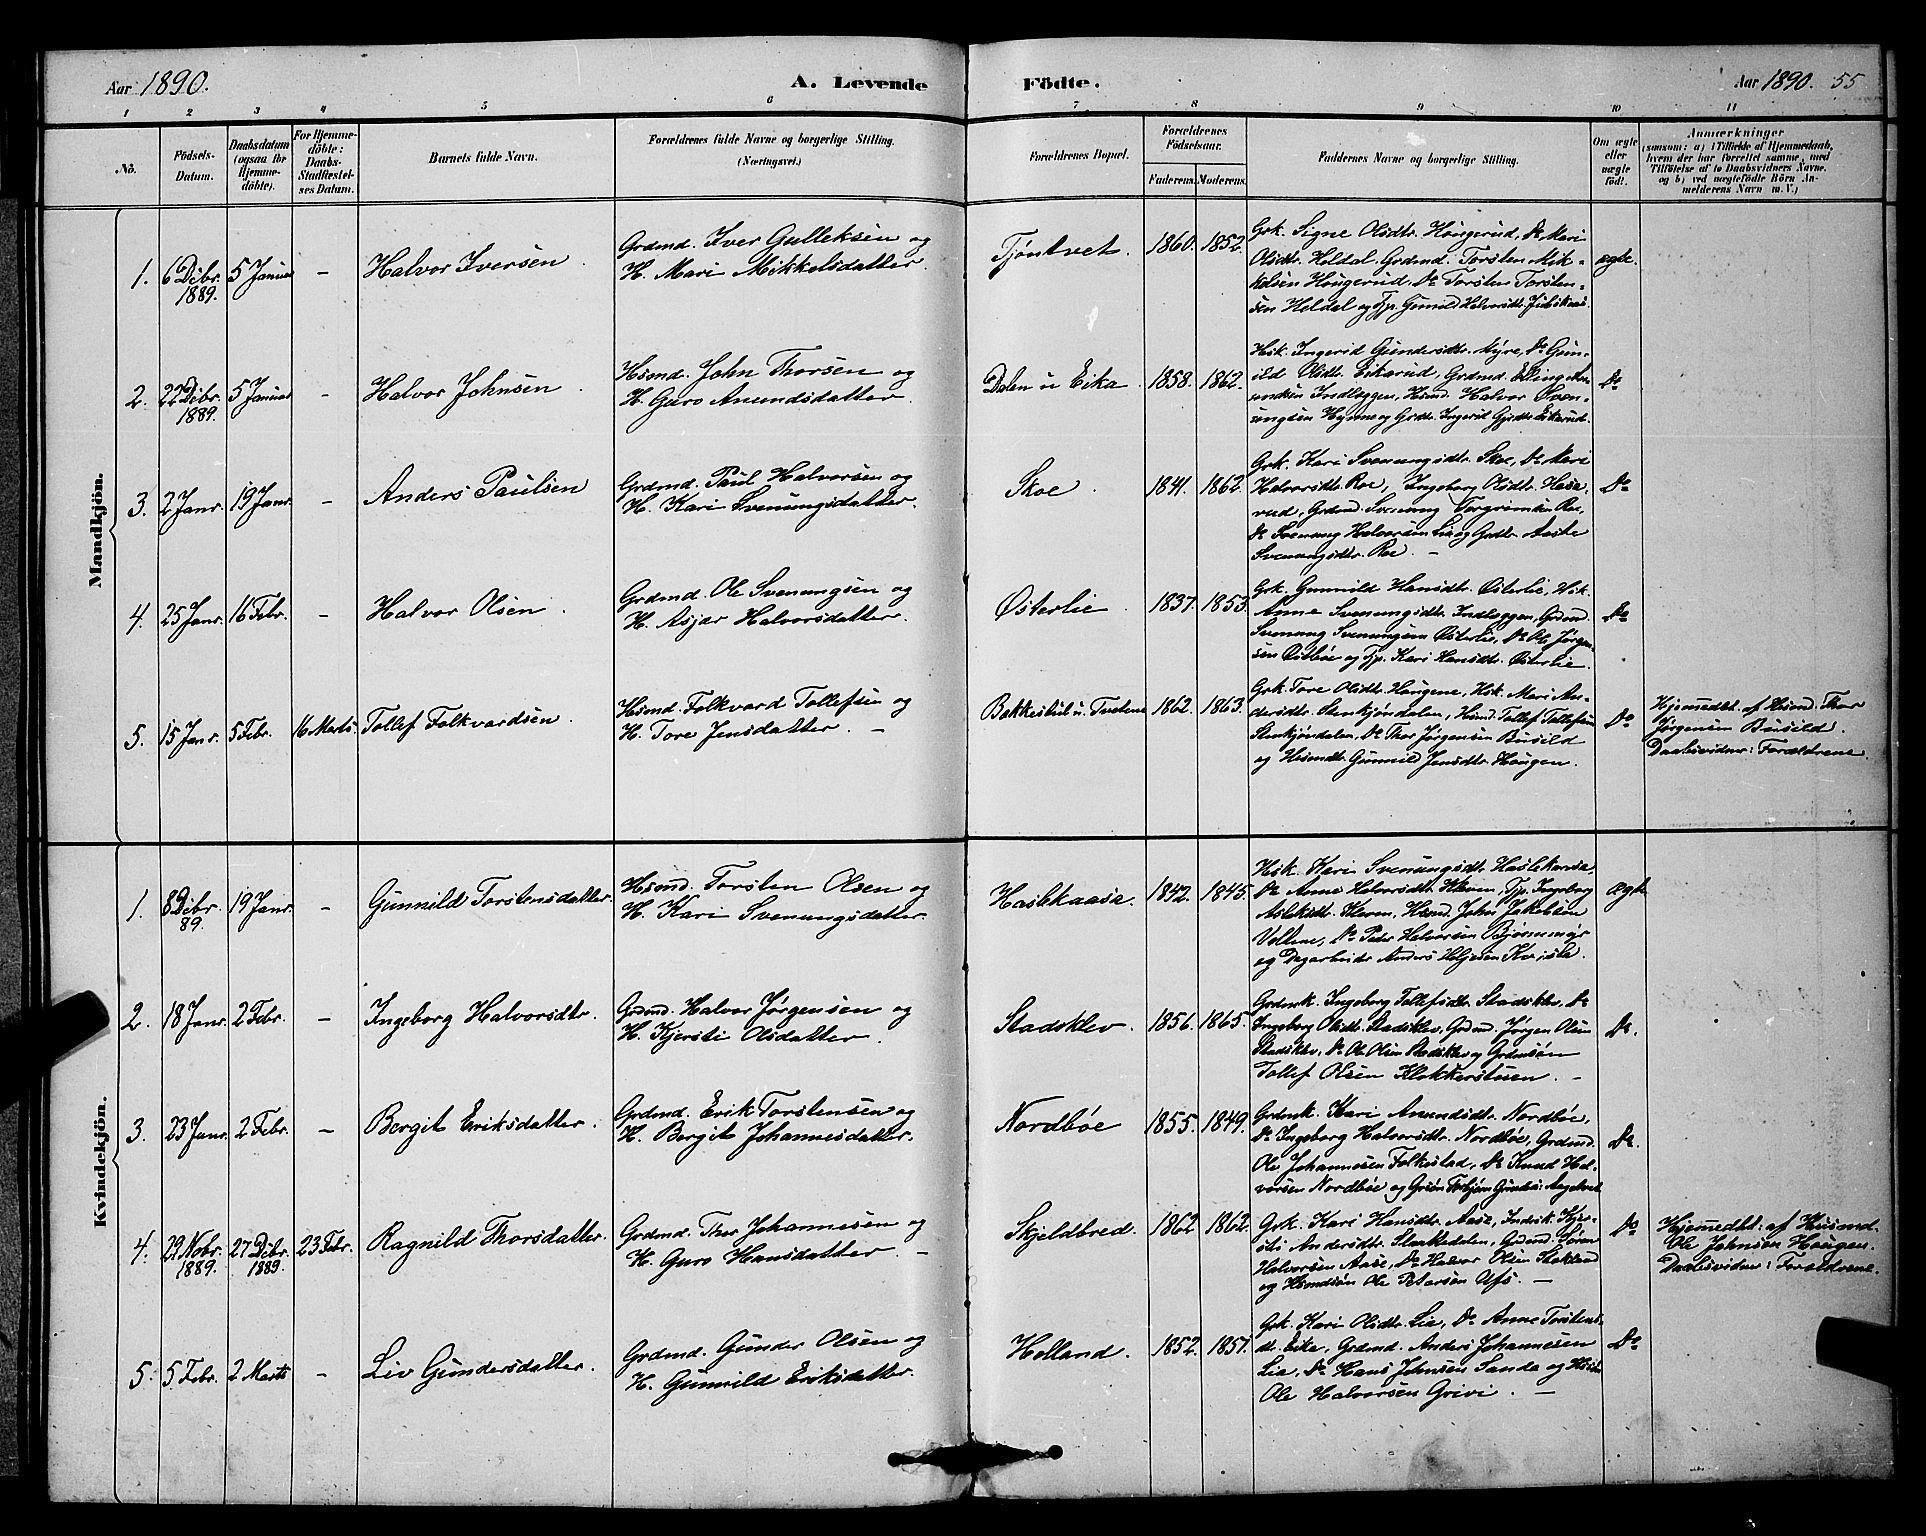 SAKO, Bø kirkebøker, G/Ga/L0005: Klokkerbok nr. 5, 1883-1897, s. 55